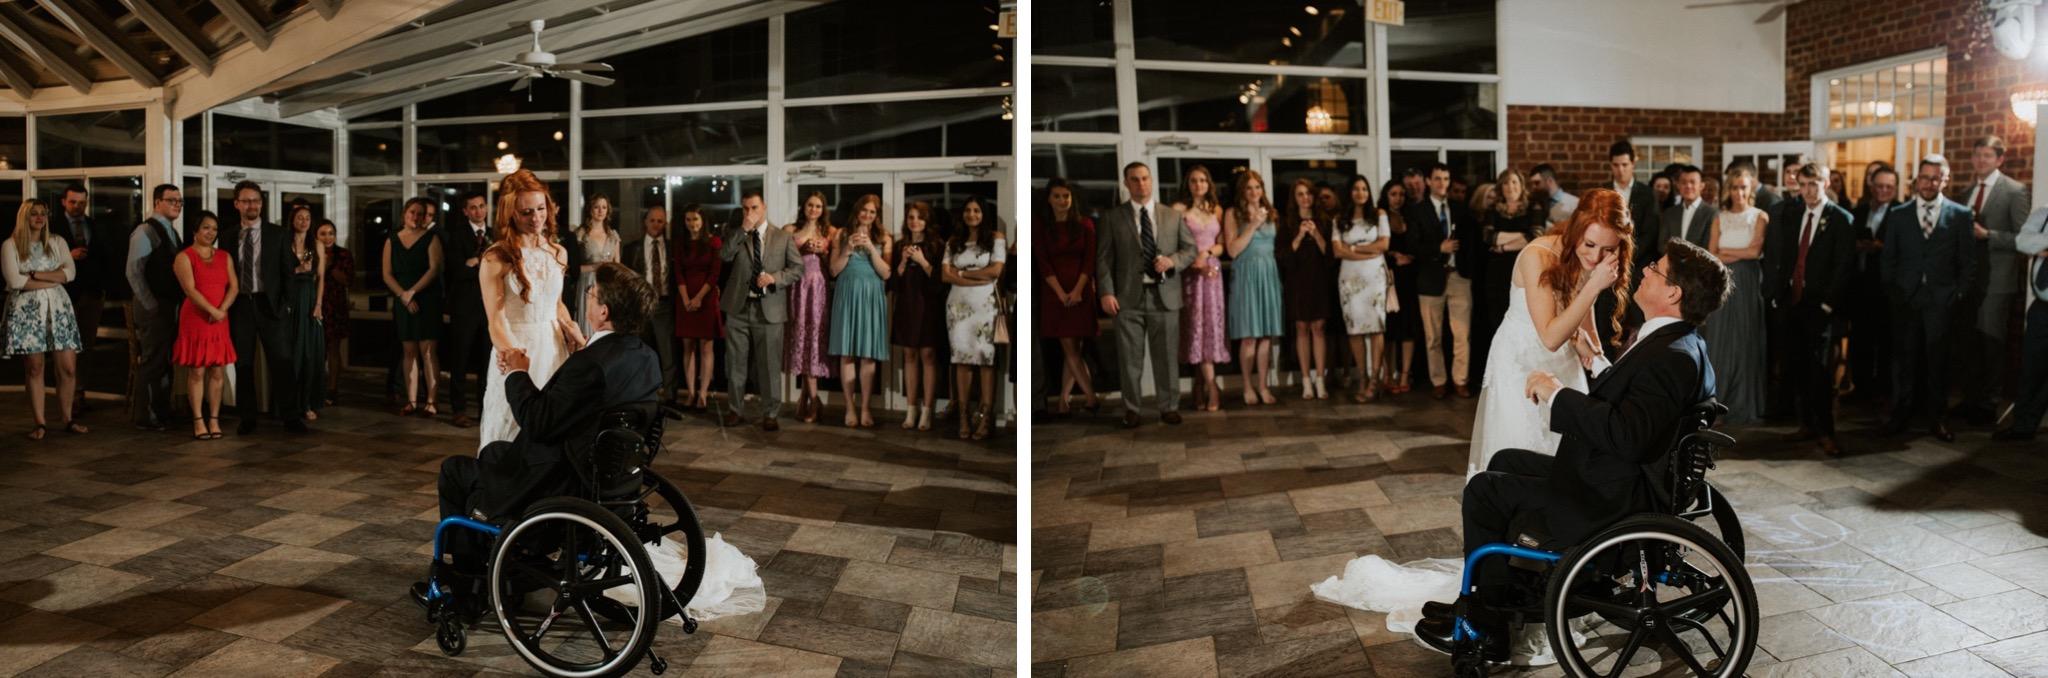 85_West Manor Estate Weddings - Pat Cori Photography-188_West Manor Estate Weddings - Pat Cori Photography-190_Wedding_dancing_VirginiaWeddingPhotographer_WestManorEstate_Weddingvenue_reception.jpg